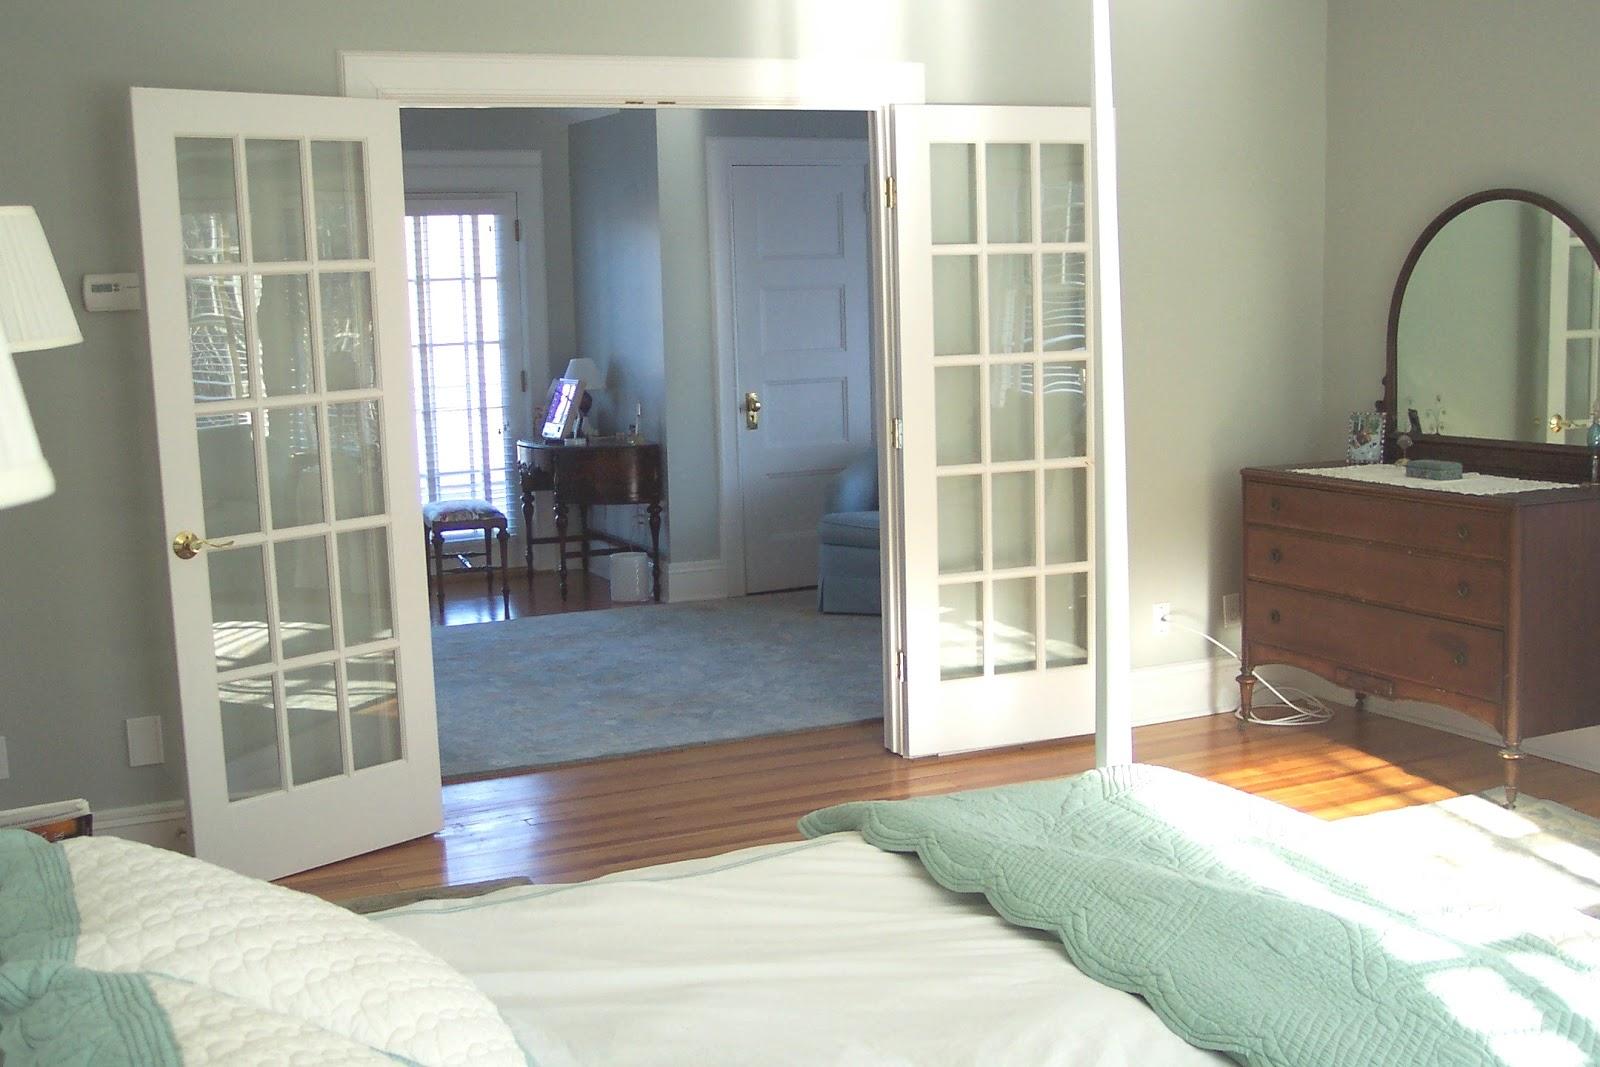 House Interior Colour Schemes Home Design Ideas